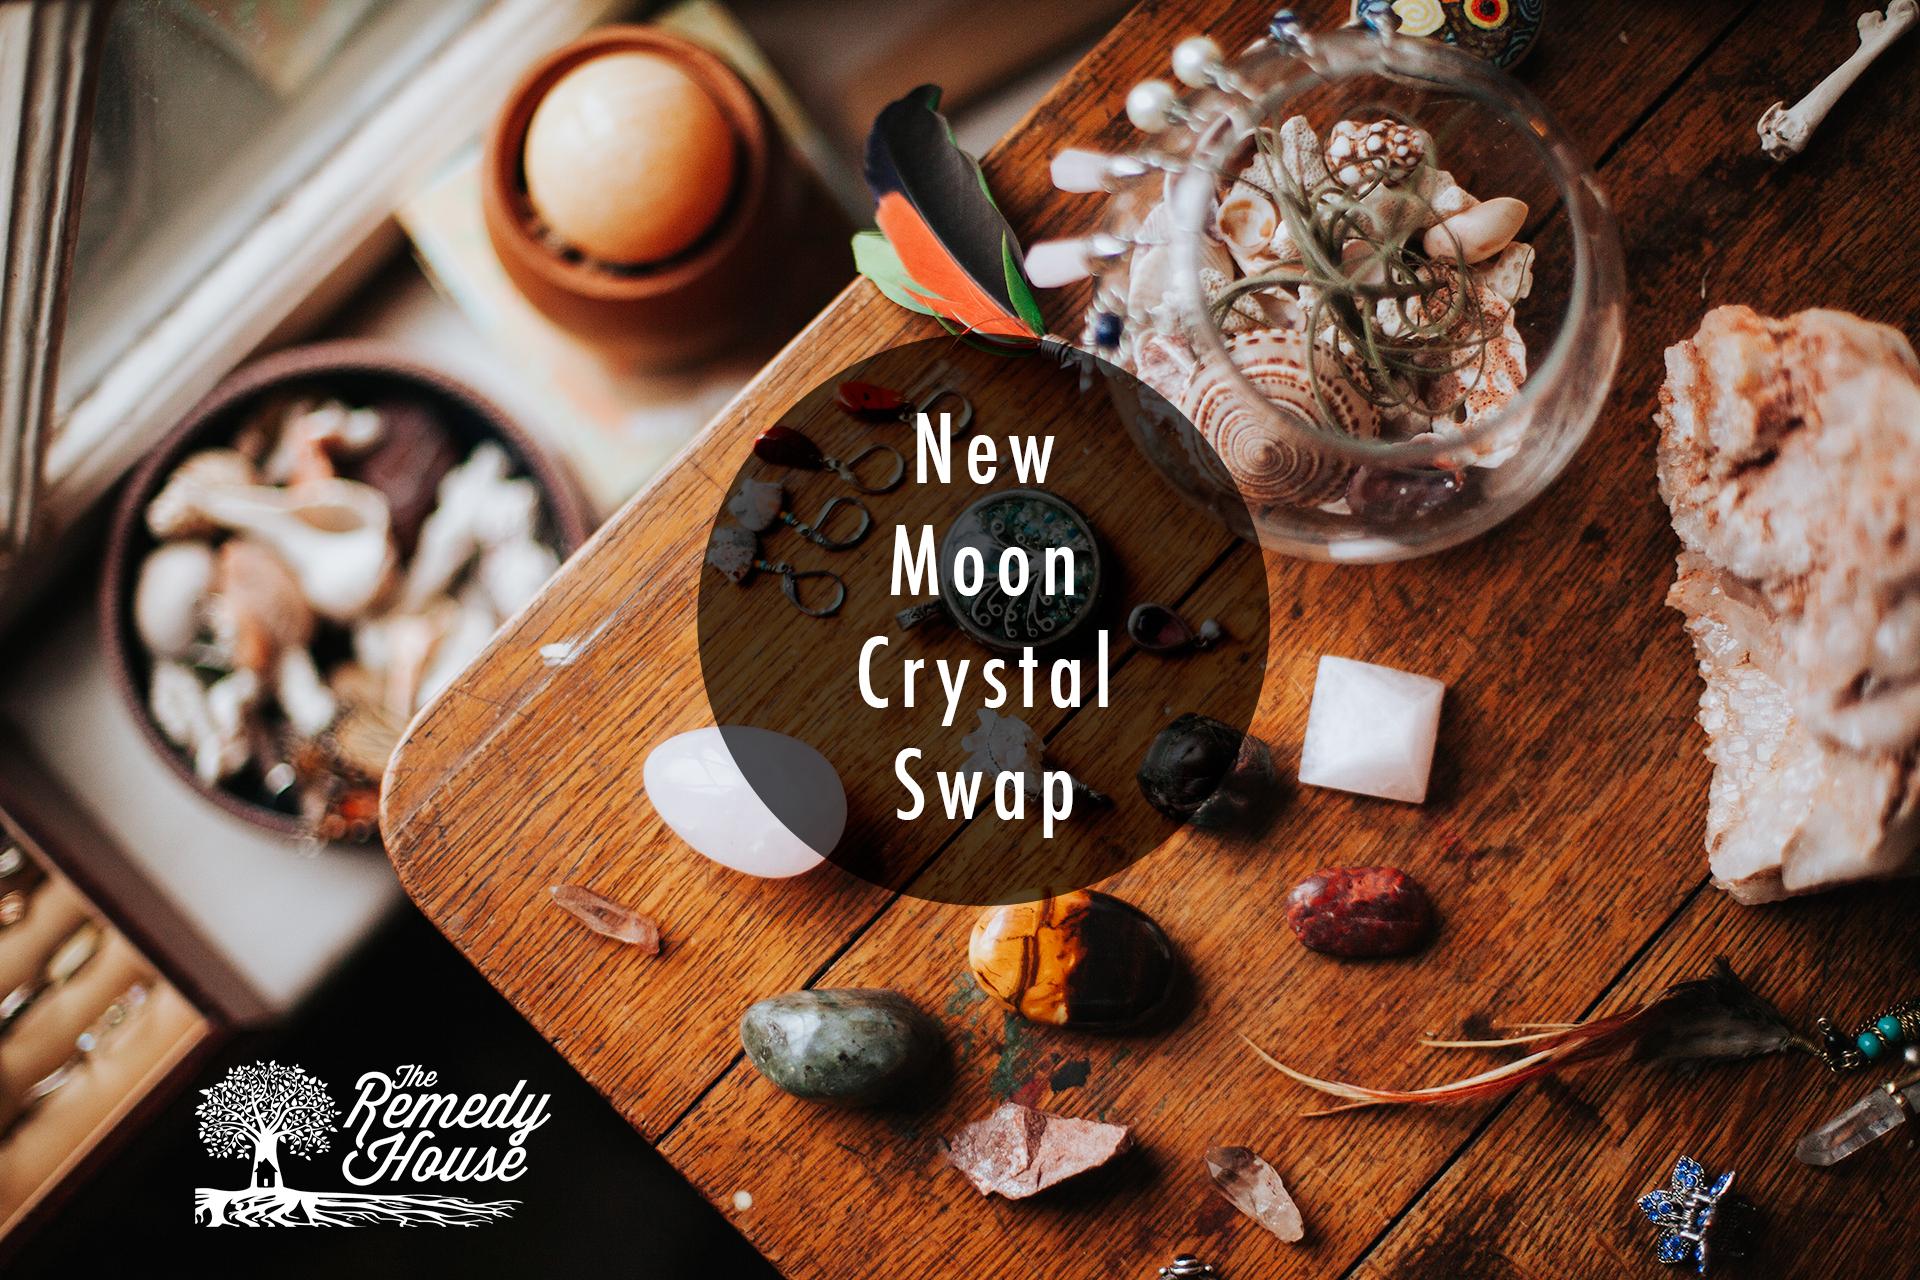 NewMoonCrystalSwap.jpg